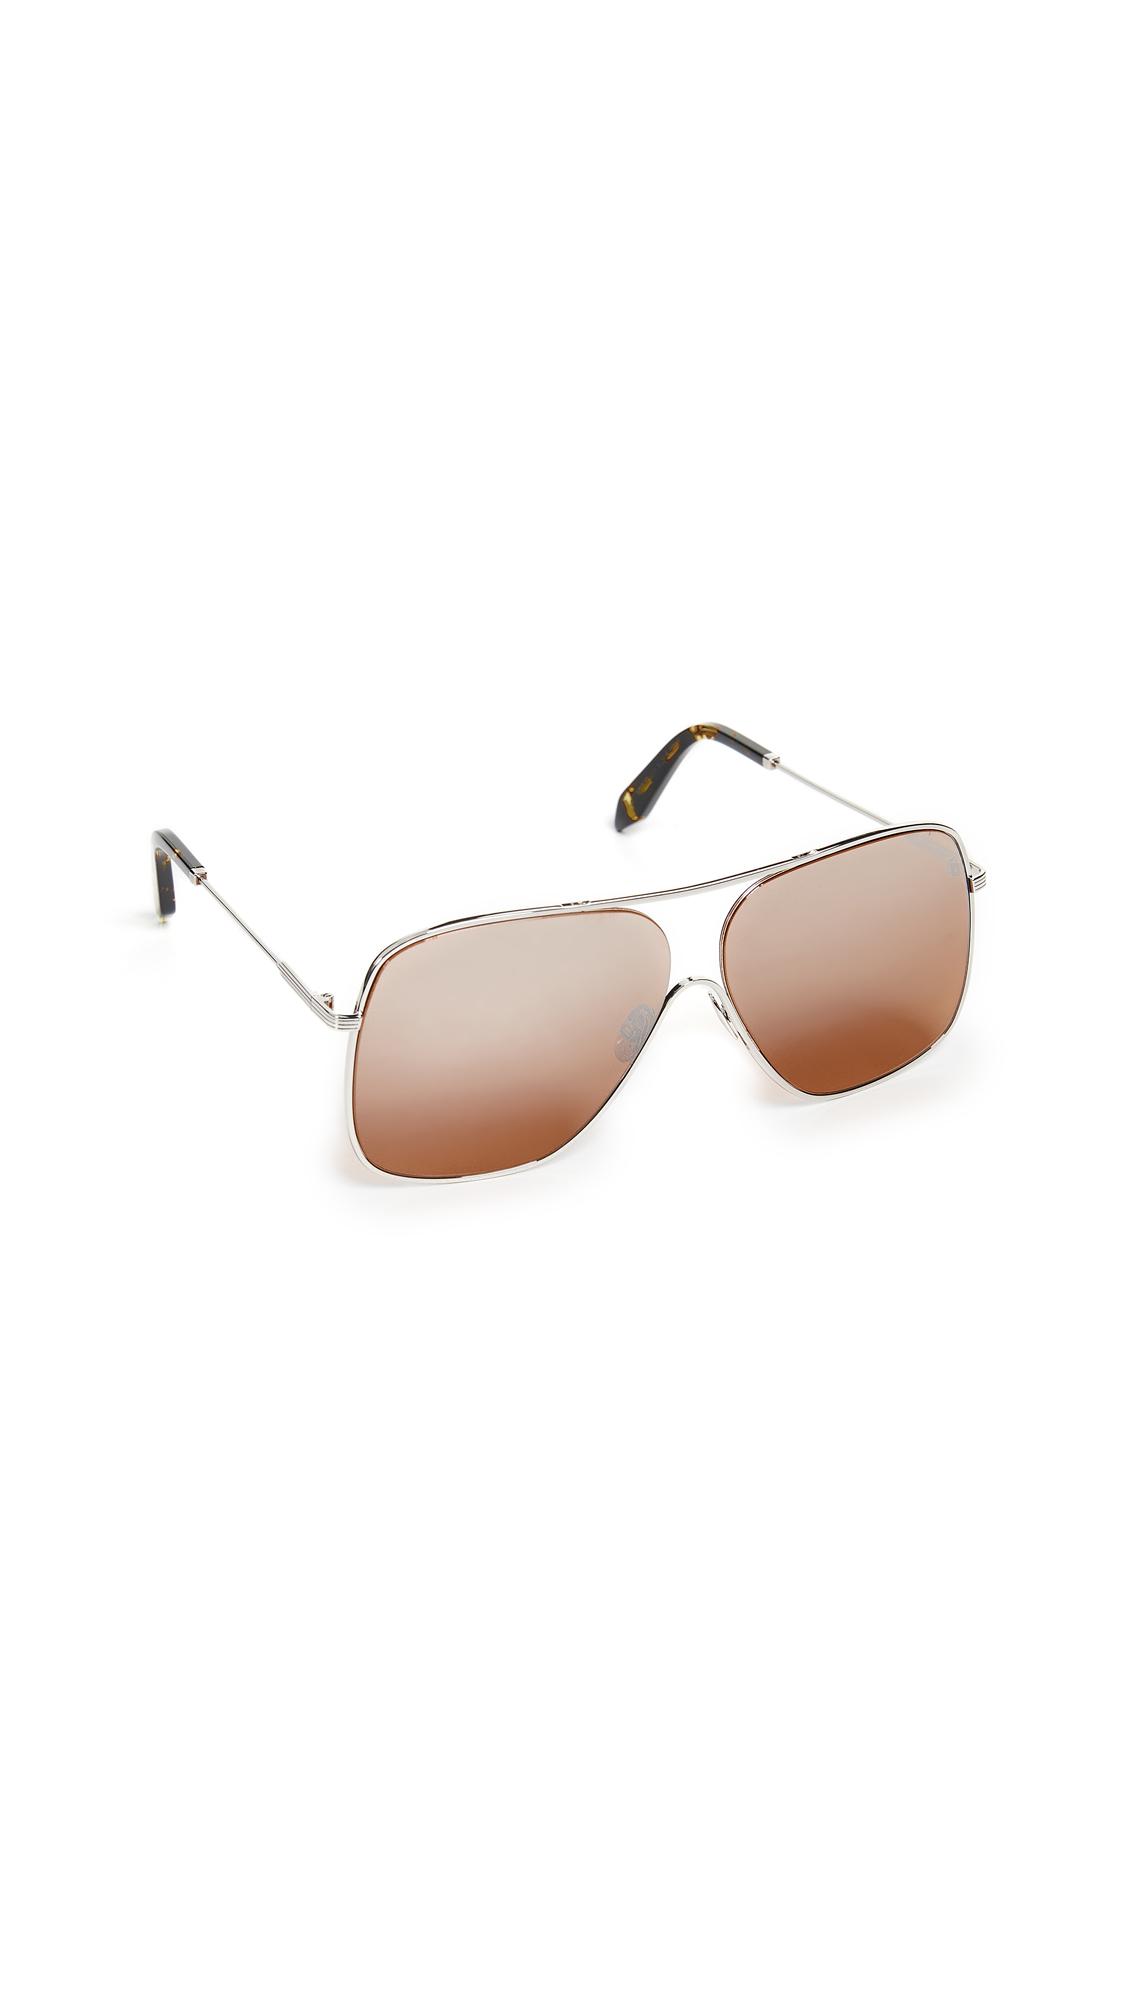 Victoria Beckham Loop Navigator Sunglasses - Phoenix